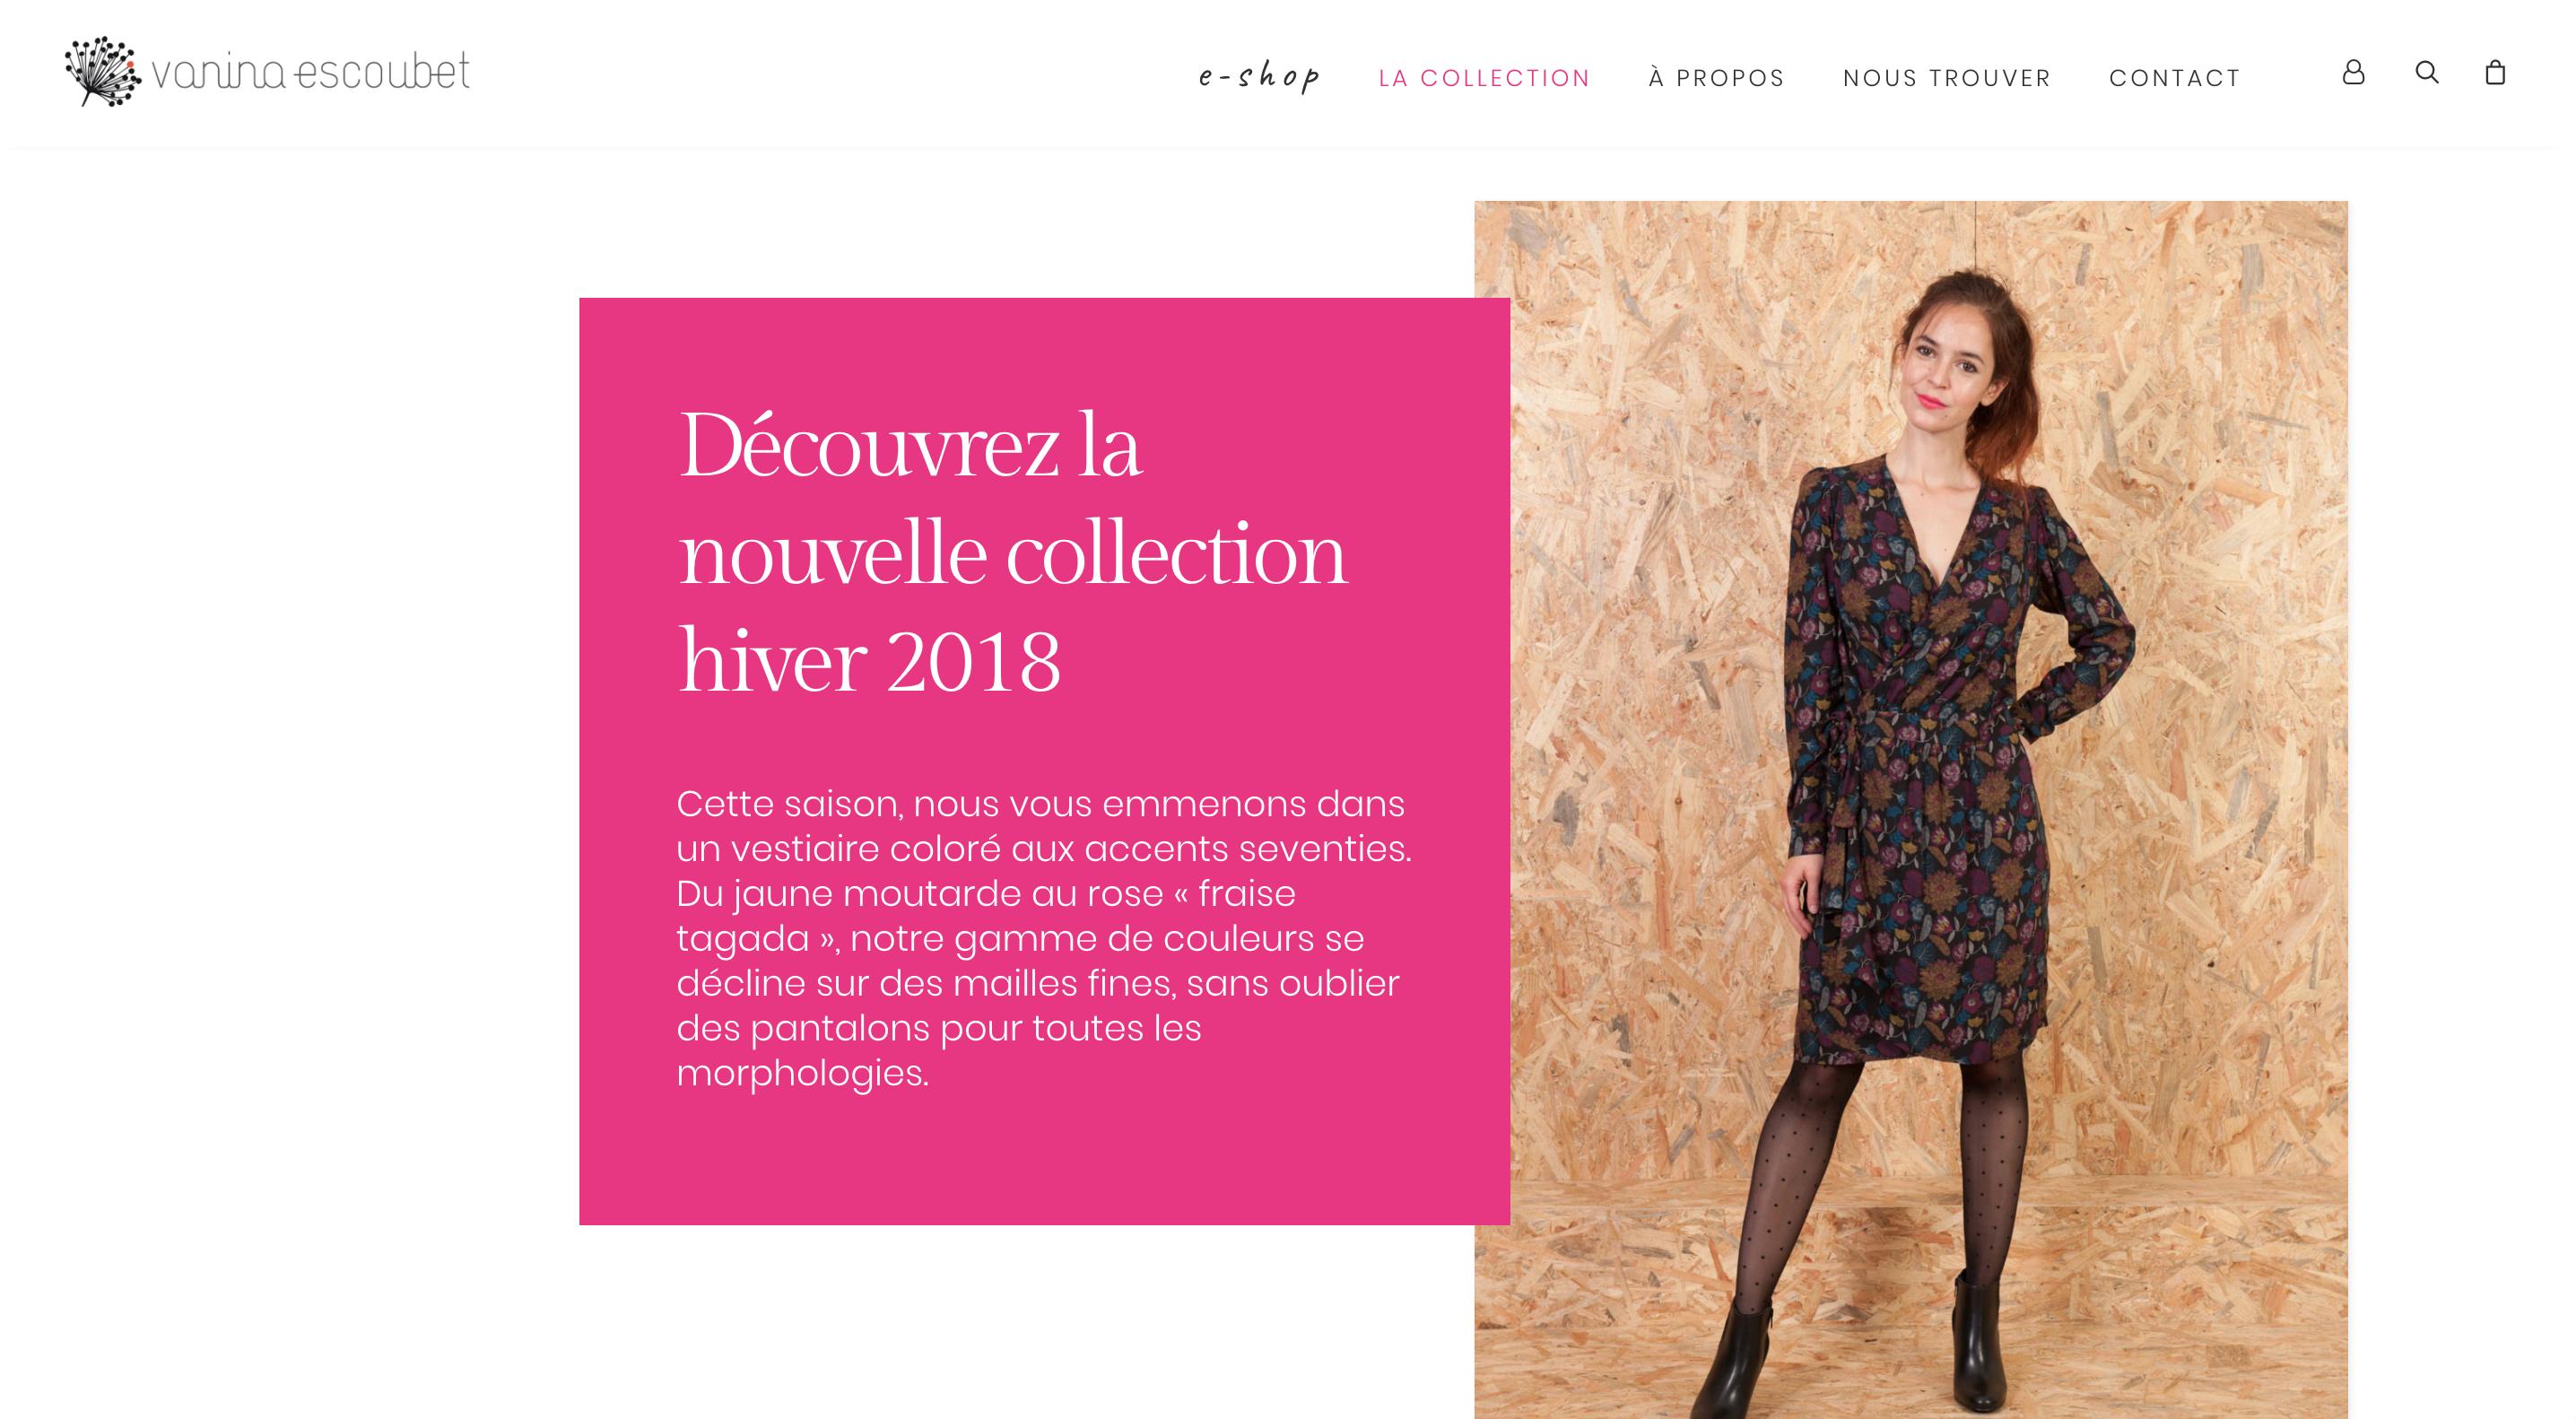 vanina-escoubet-website-screenshot